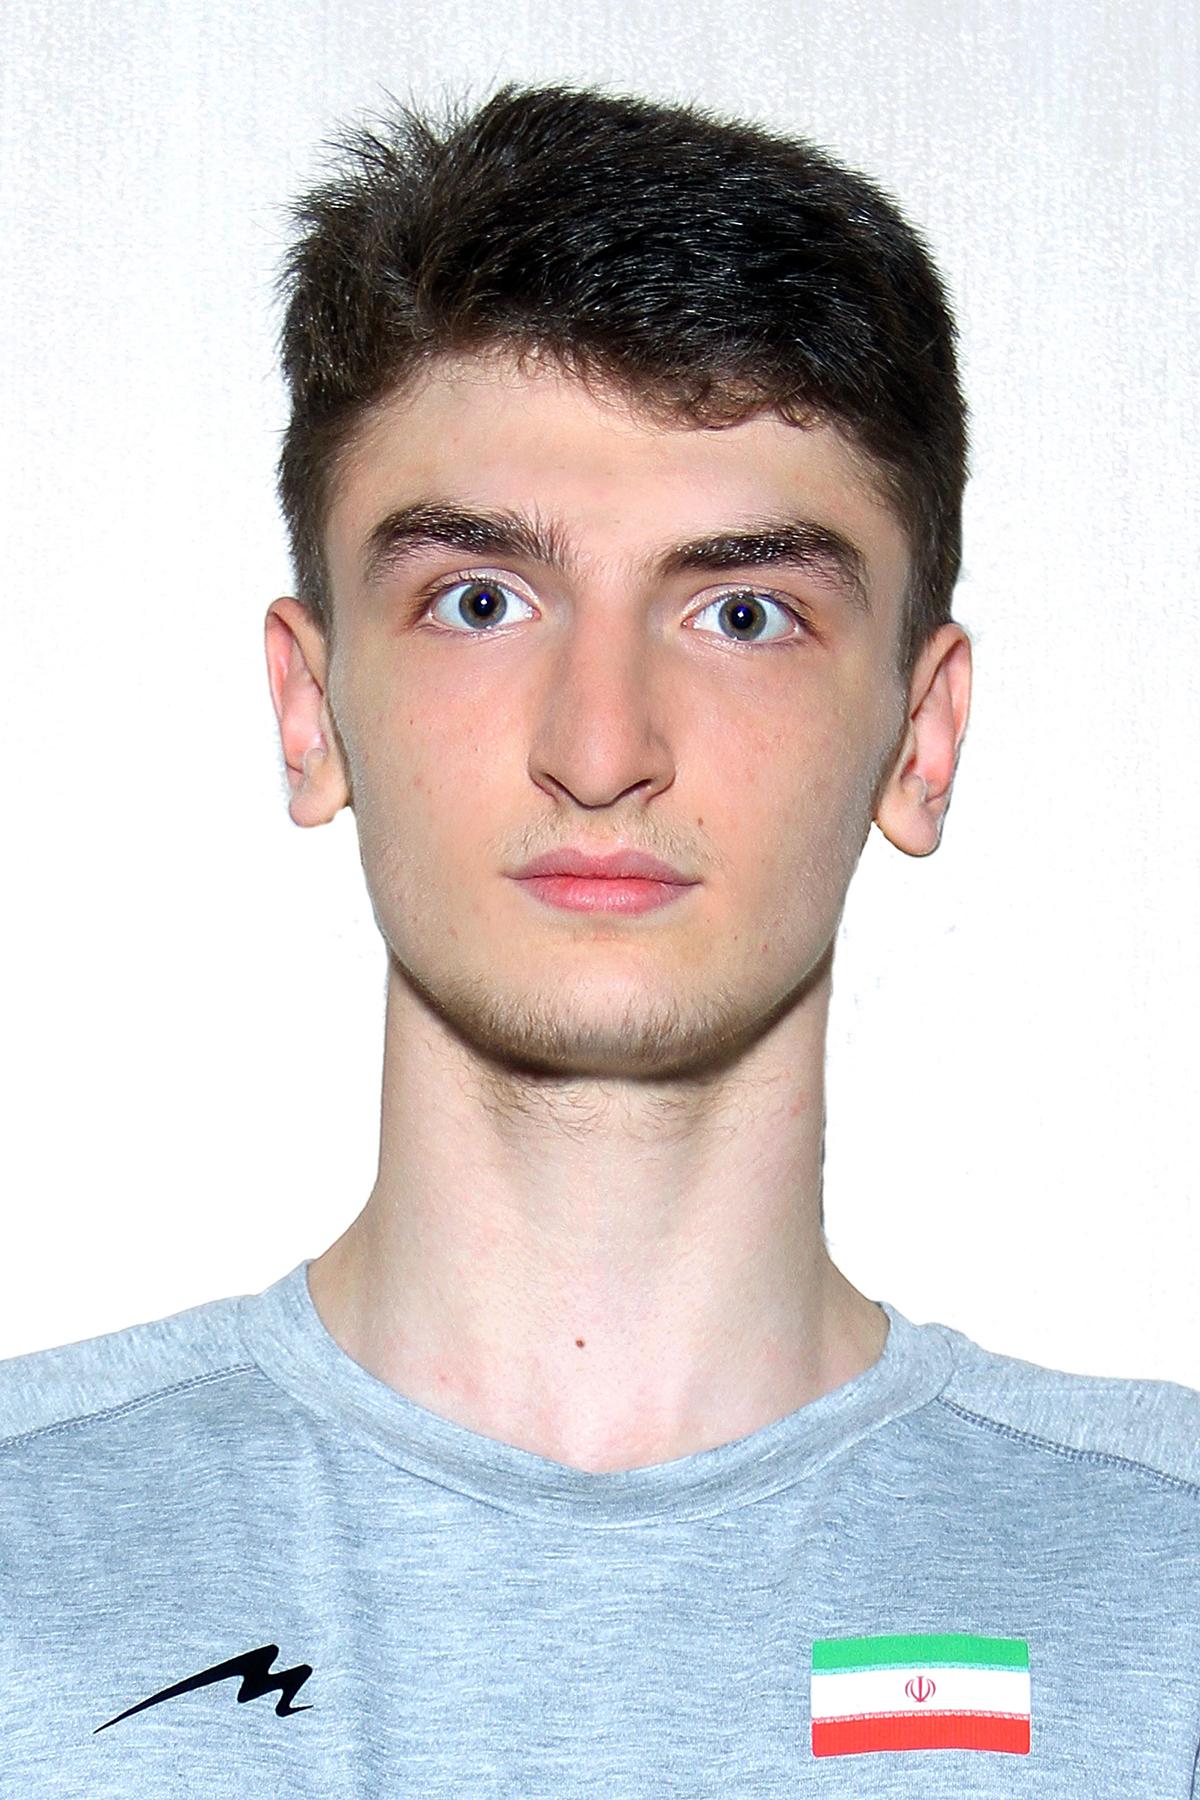 Mahdi Jelveh Ghaziani